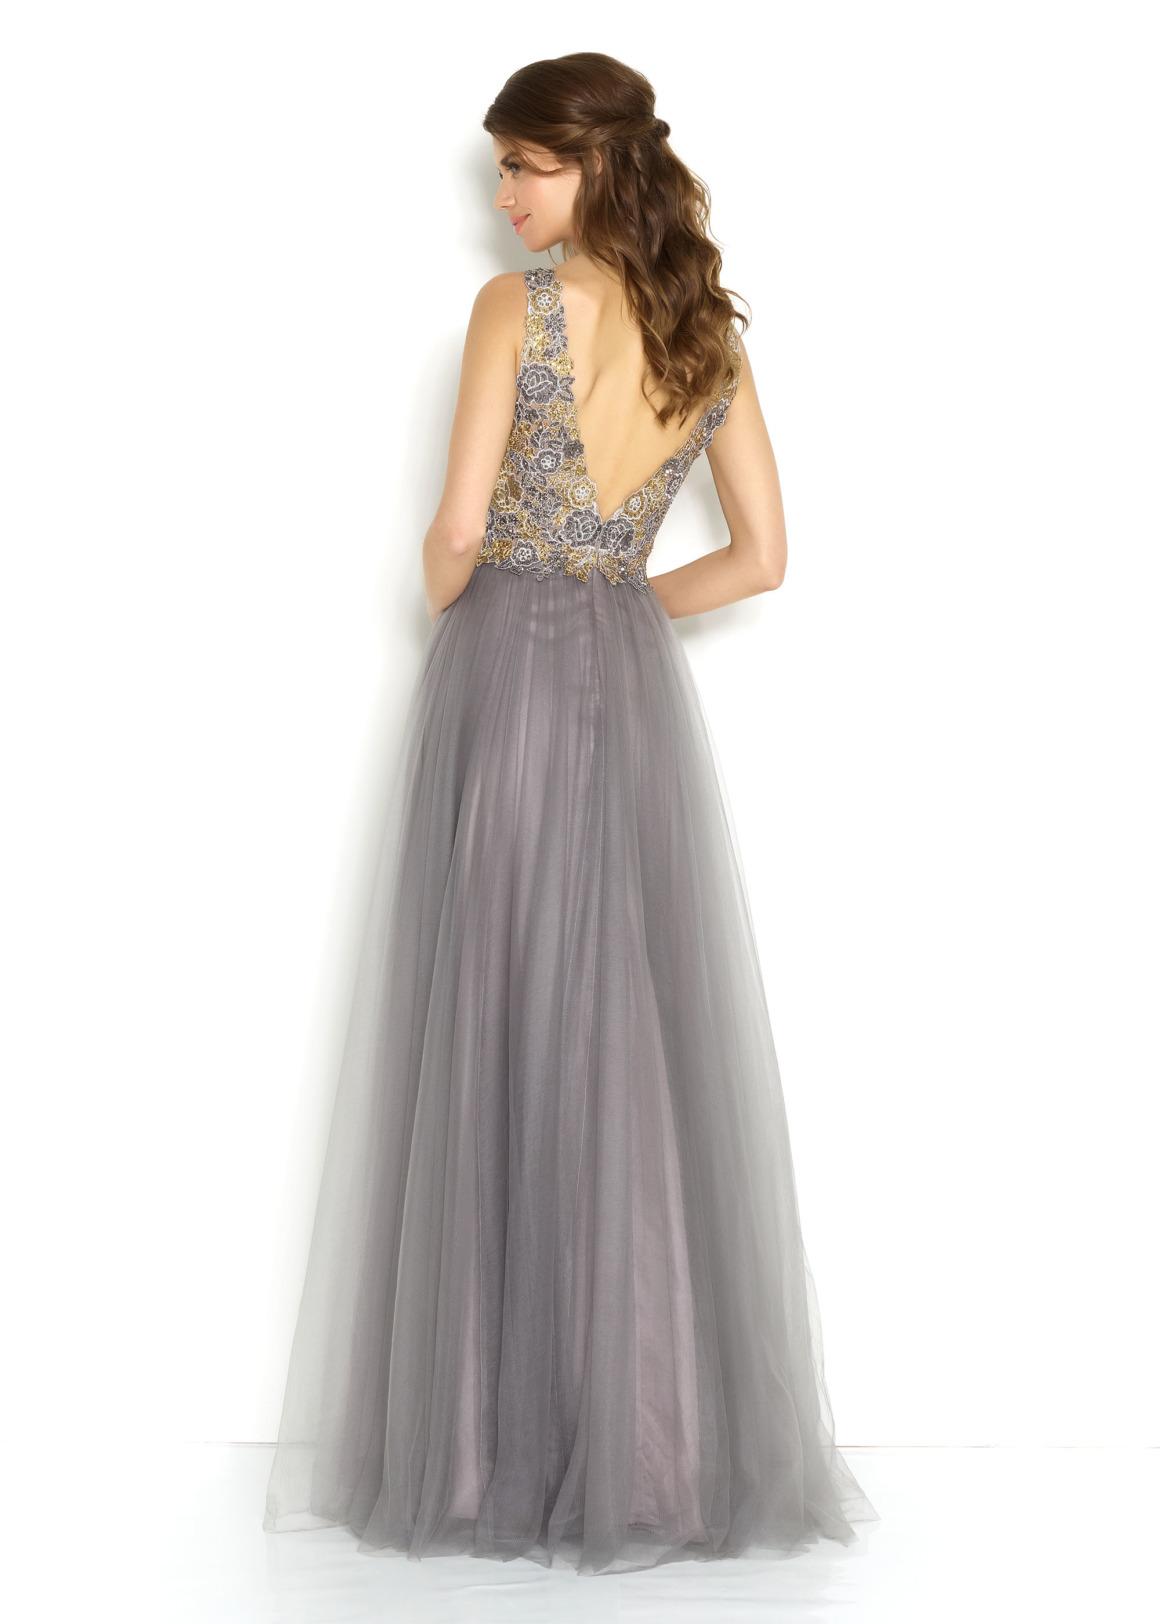 Schützenfest Königinnenkleid Abiball Hofdamen Hofstaat langes Kleid Oberteil mit Pailetten und Perlen silber grau Tüll Rock Rücken V-Ausschnitt